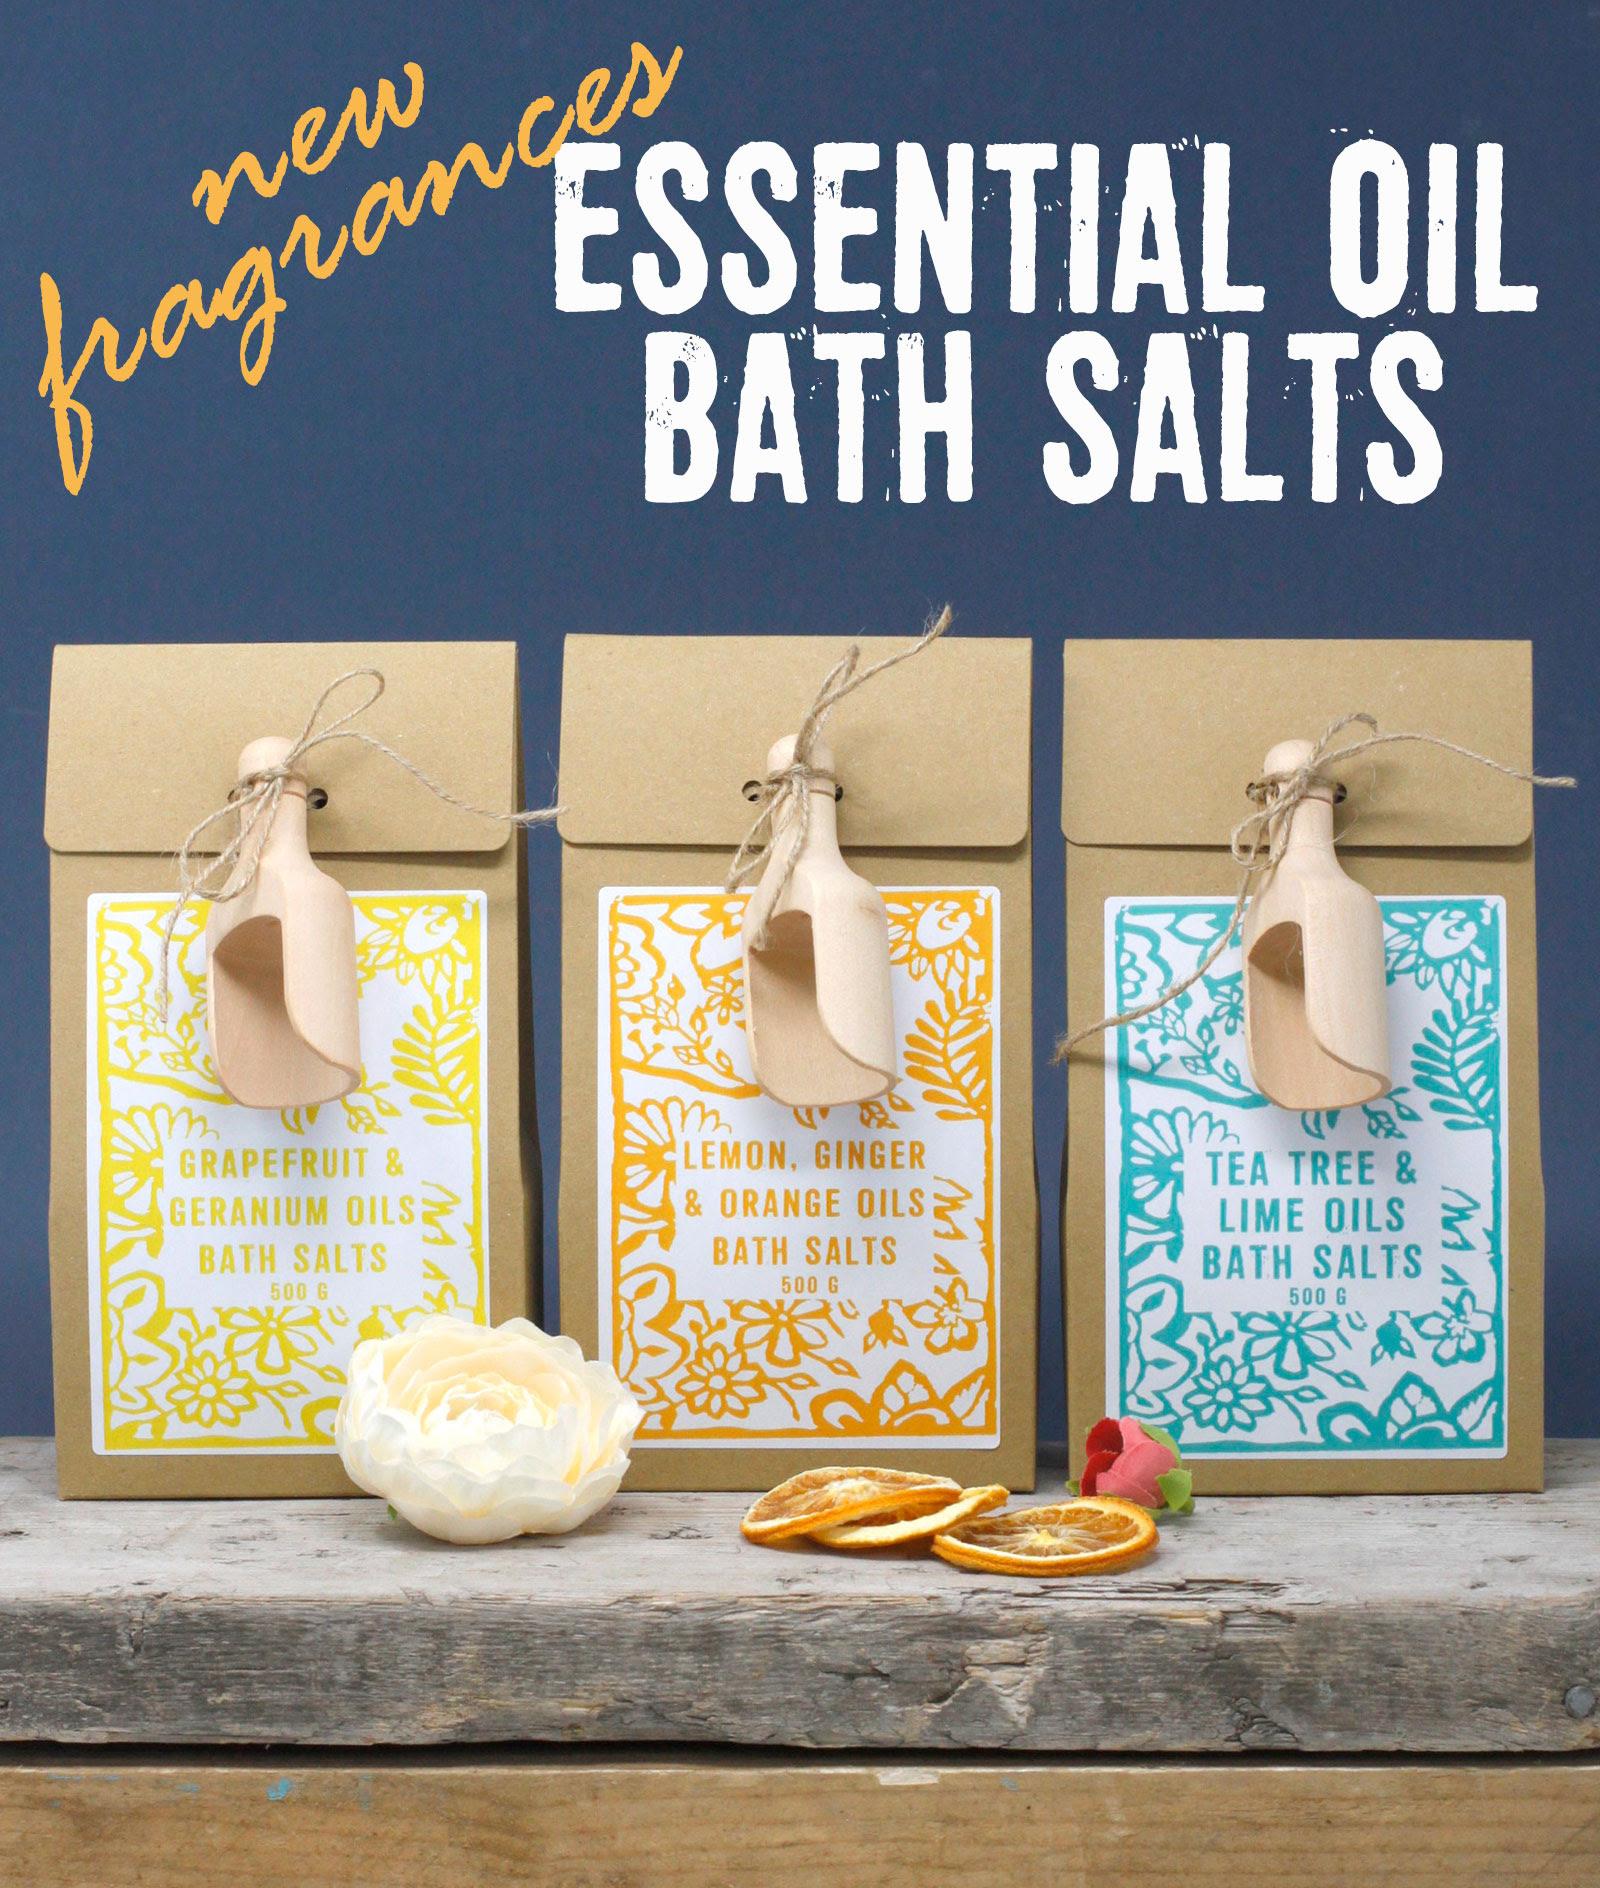 Agnes and Cat - Bath Salts 500g